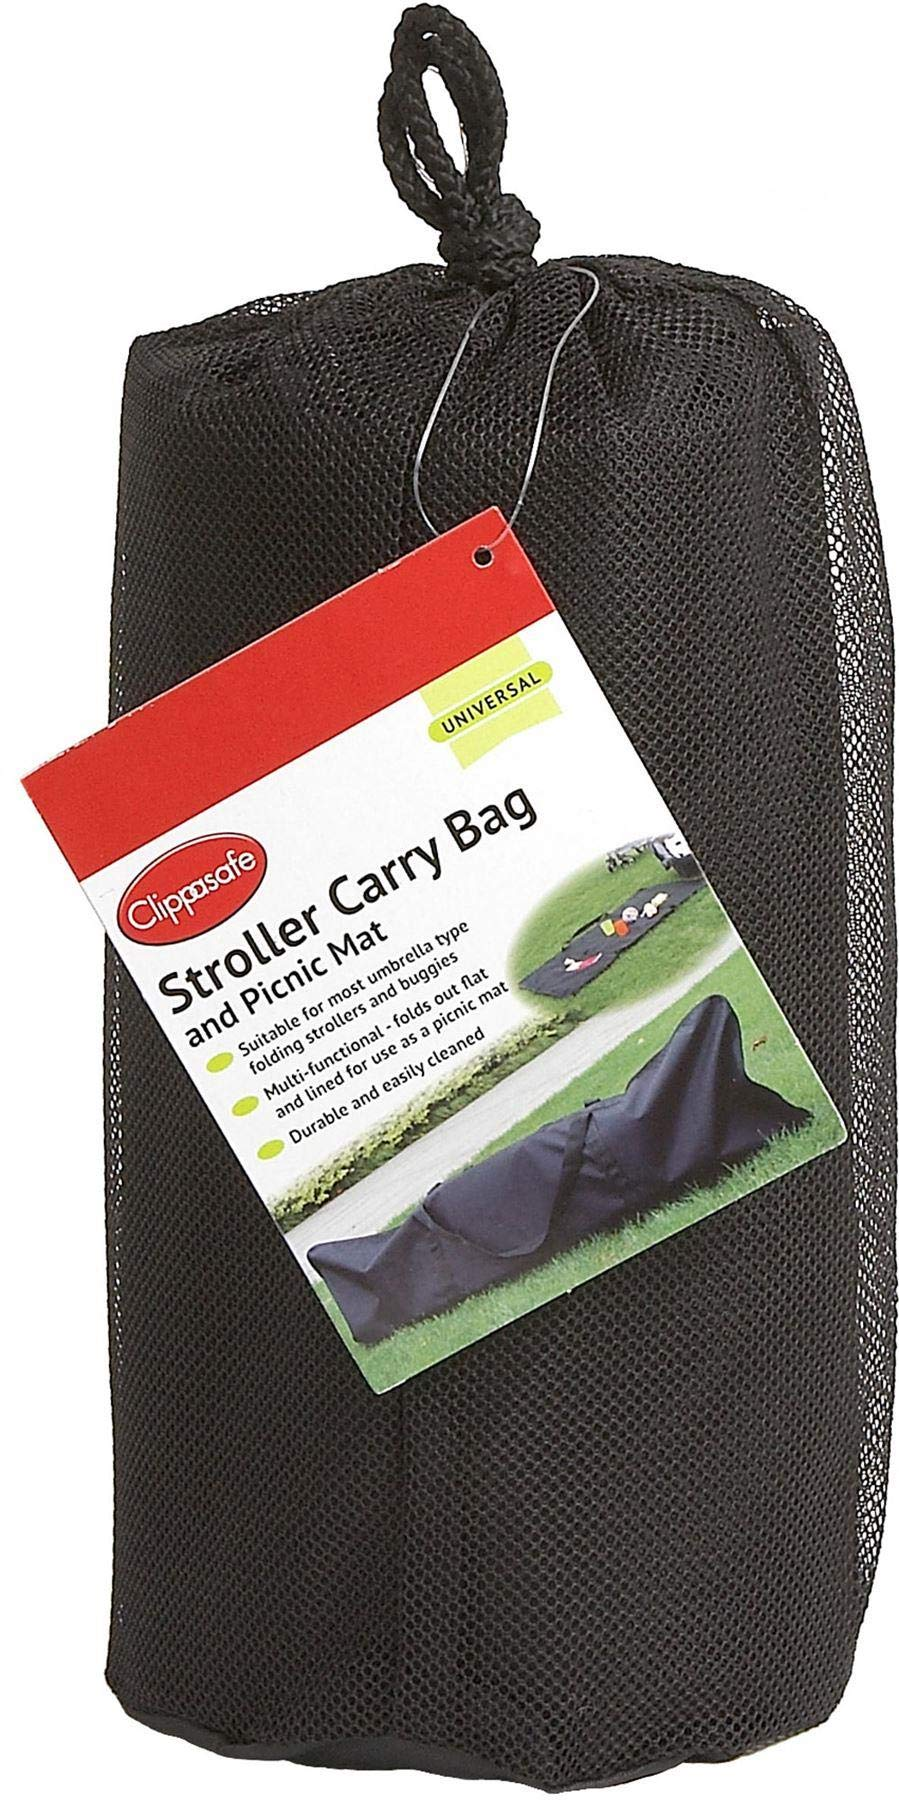 Clippasafe Stroller Carry Bag & Picnic Mat